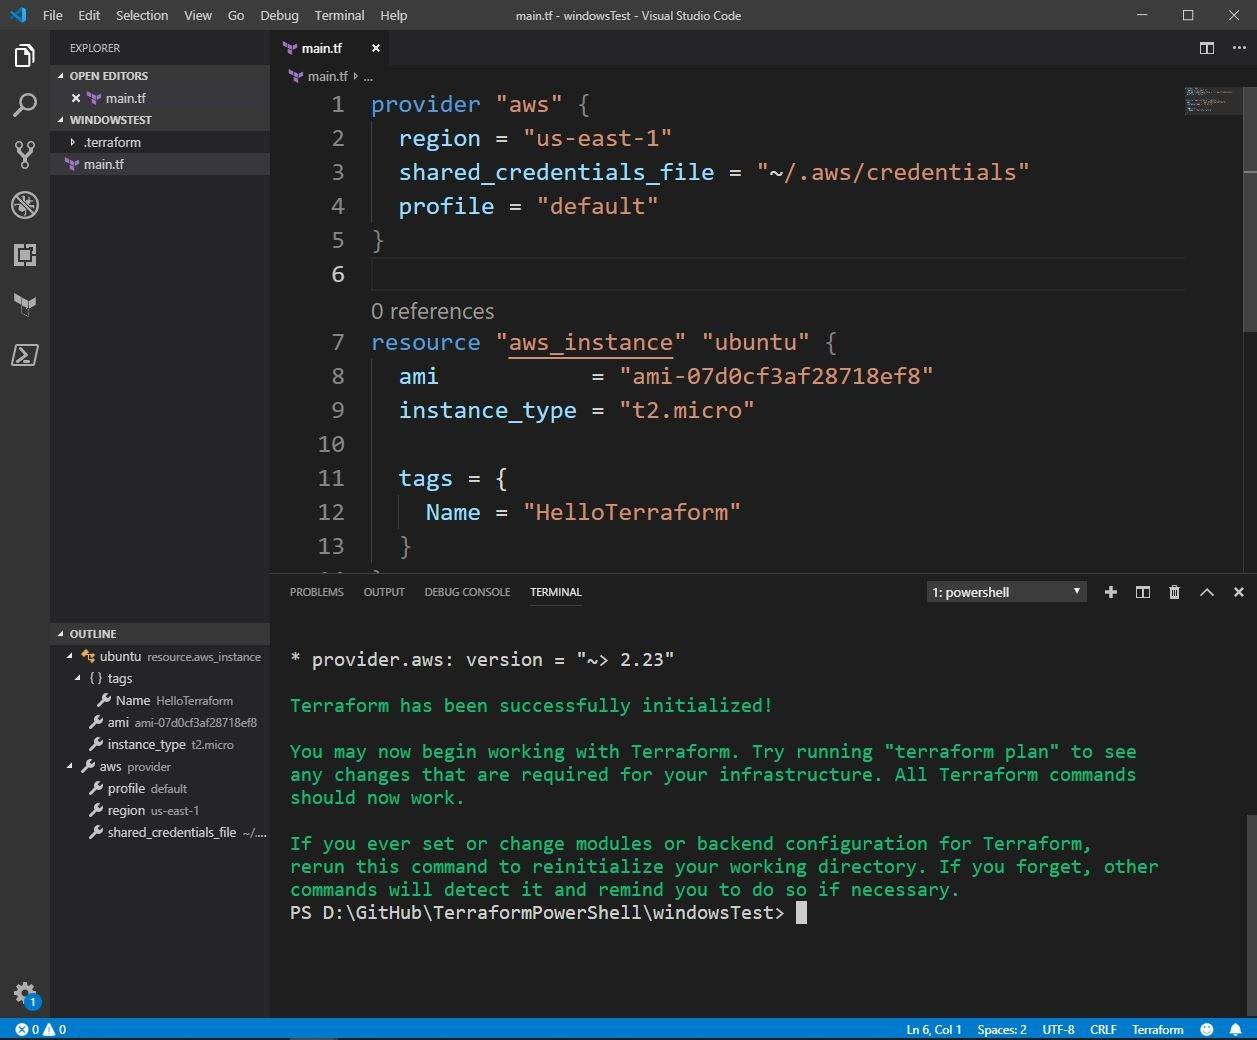 Getting Started with Terraform on Windows (Demo Walkthrough)